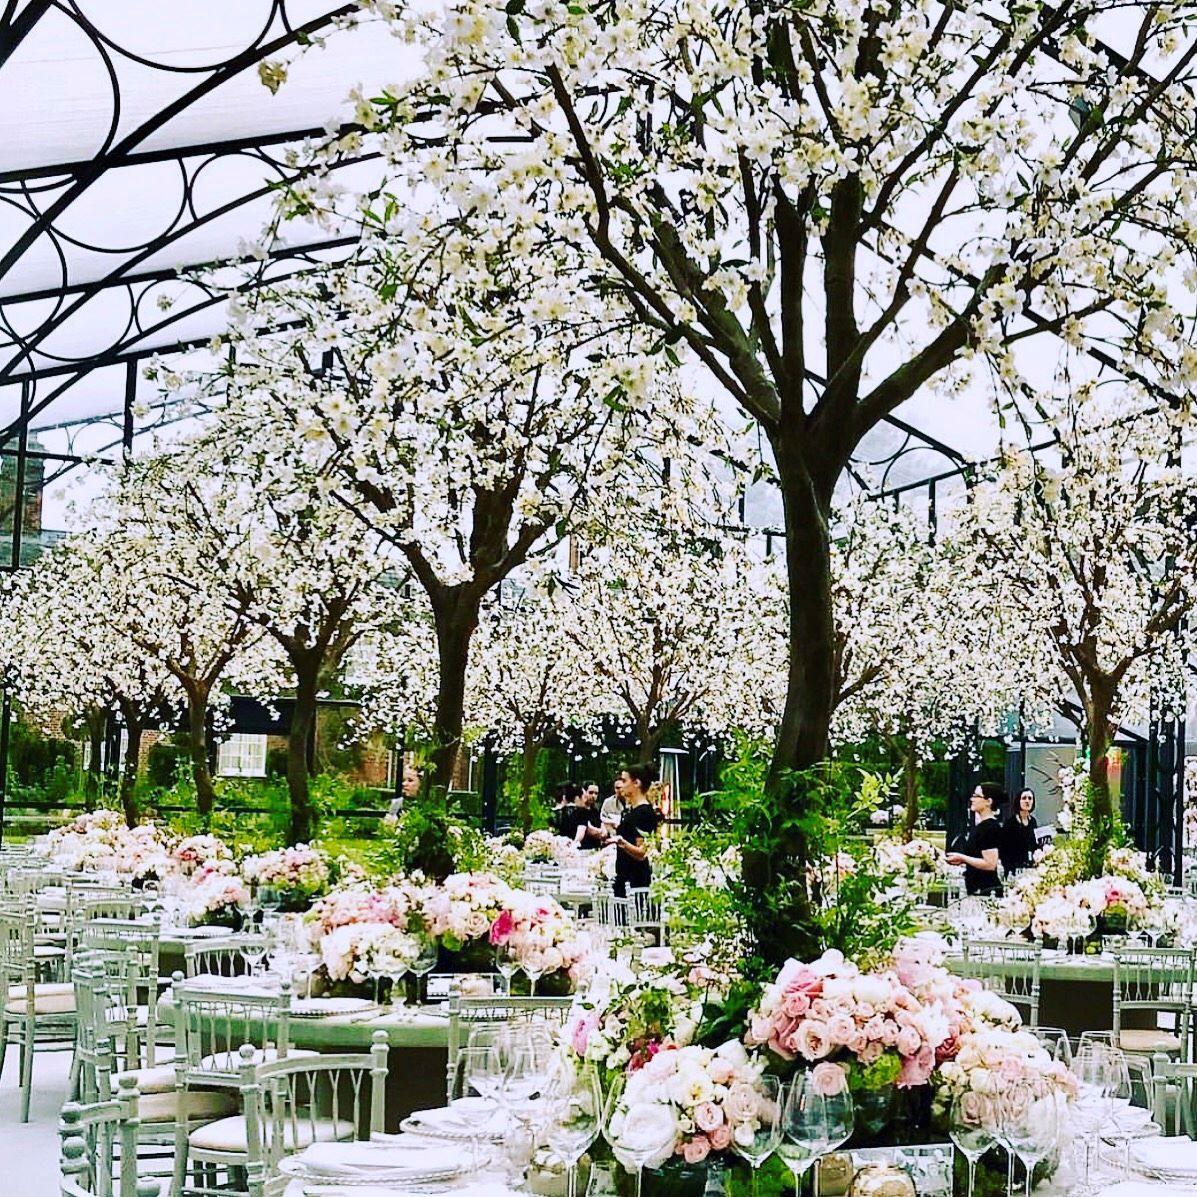 Pippa S Exclusive Glhouse Featured Gorgeous Fl Decor Within Middleton Dreamy Wedding To Hedge